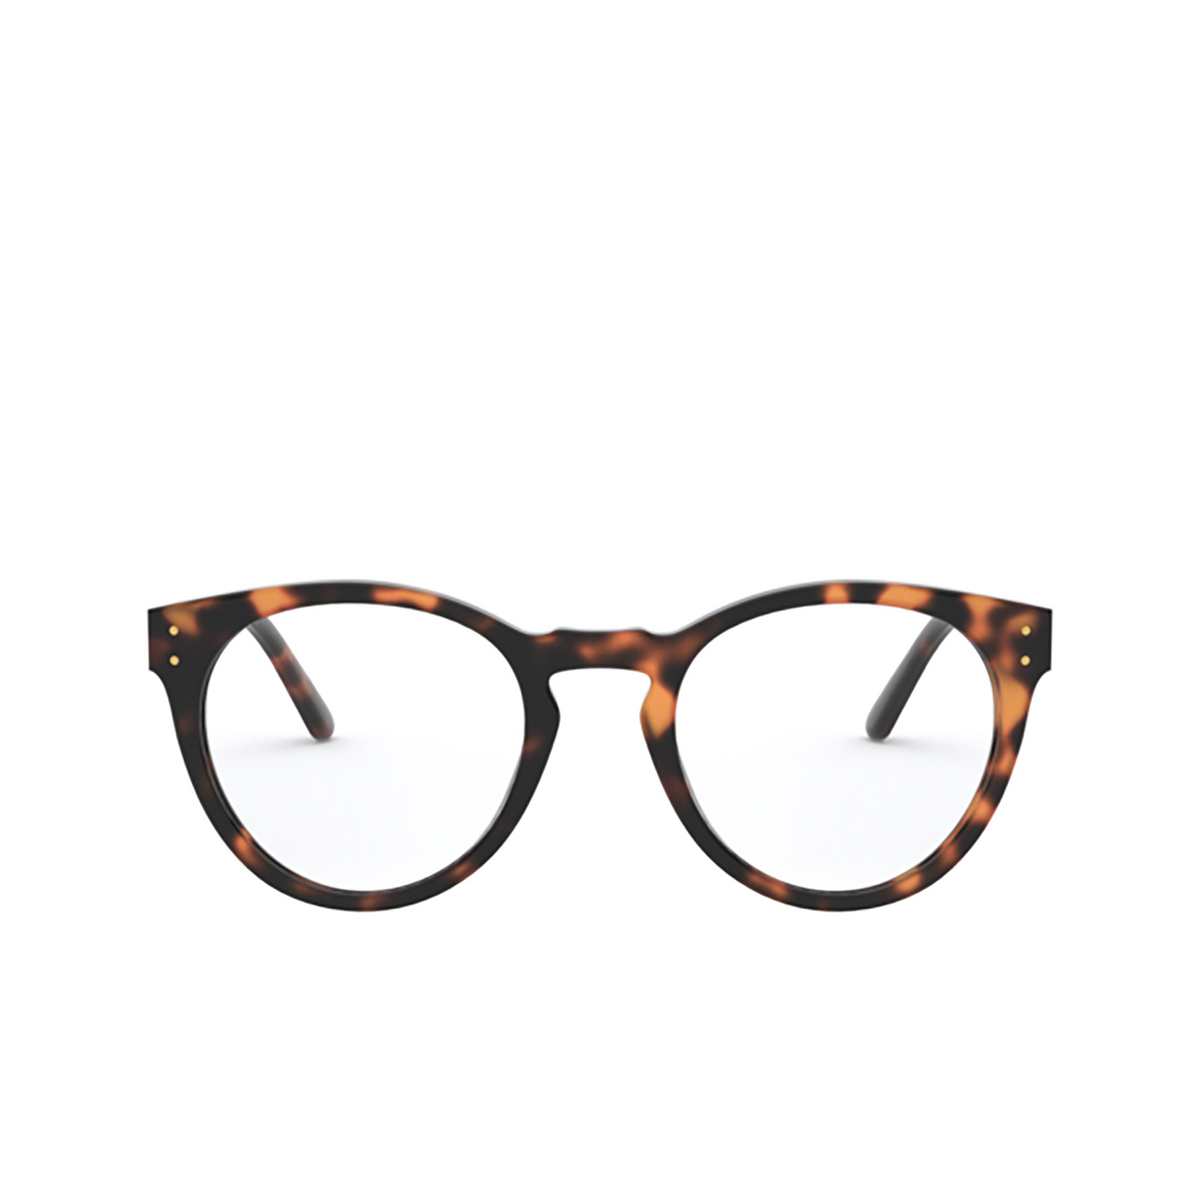 Polo Ralph Lauren® Round Eyeglasses: PH2215 color Shiny Jc Tortoise 5303 - front view.